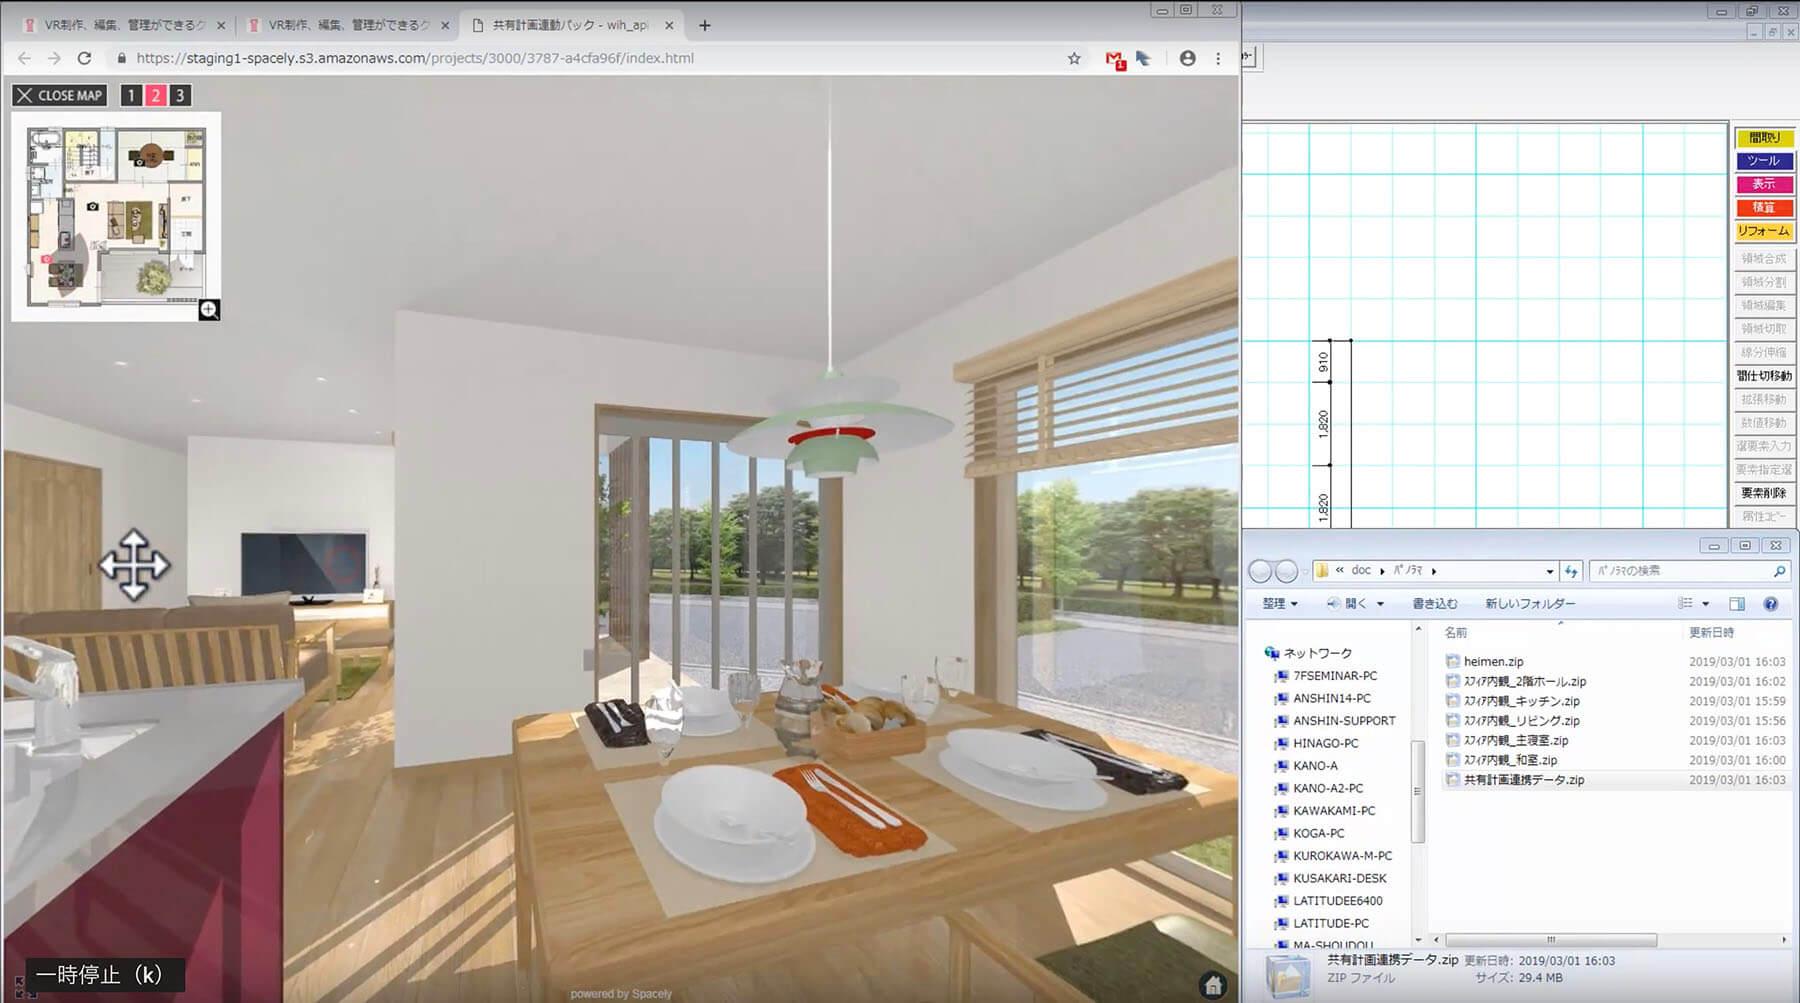 3DキャドソフトWalk in homeから高品質なクラウドVRコンテンツが数秒で制作可能に